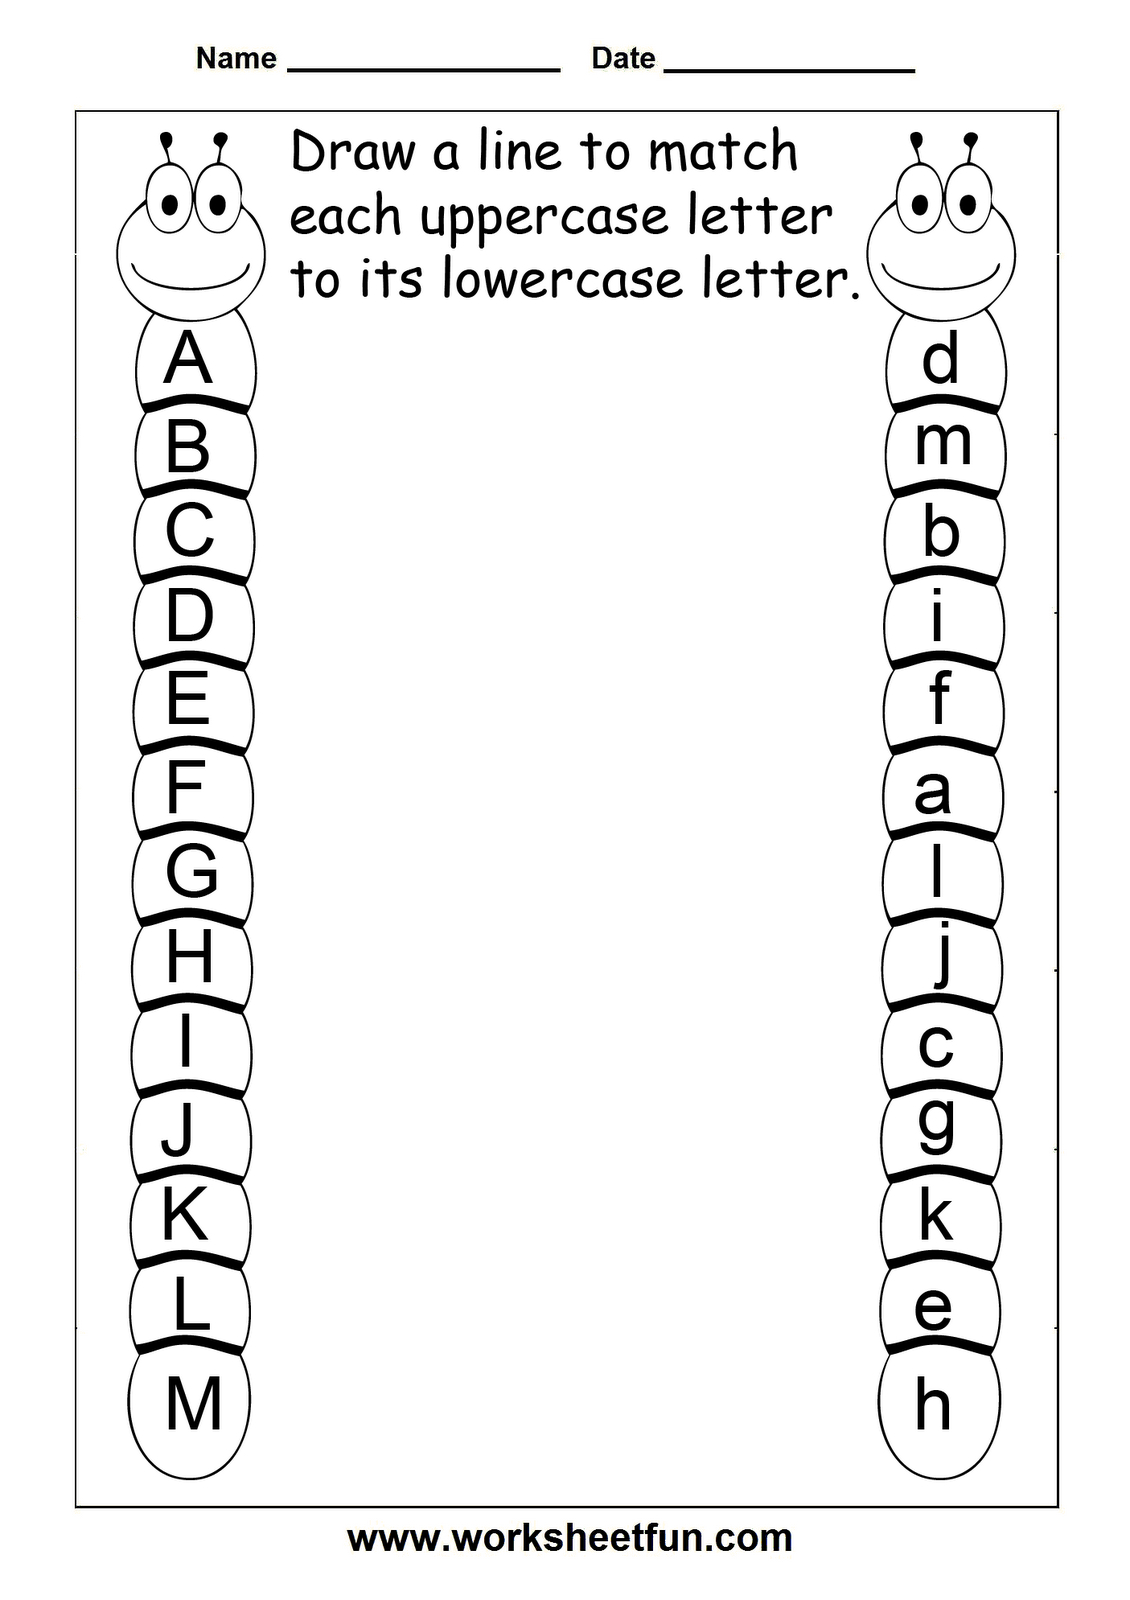 Pinashley Hibbs On Kiddo | Kindergarten Worksheets, Preschool | Abc Matching Worksheets Printable